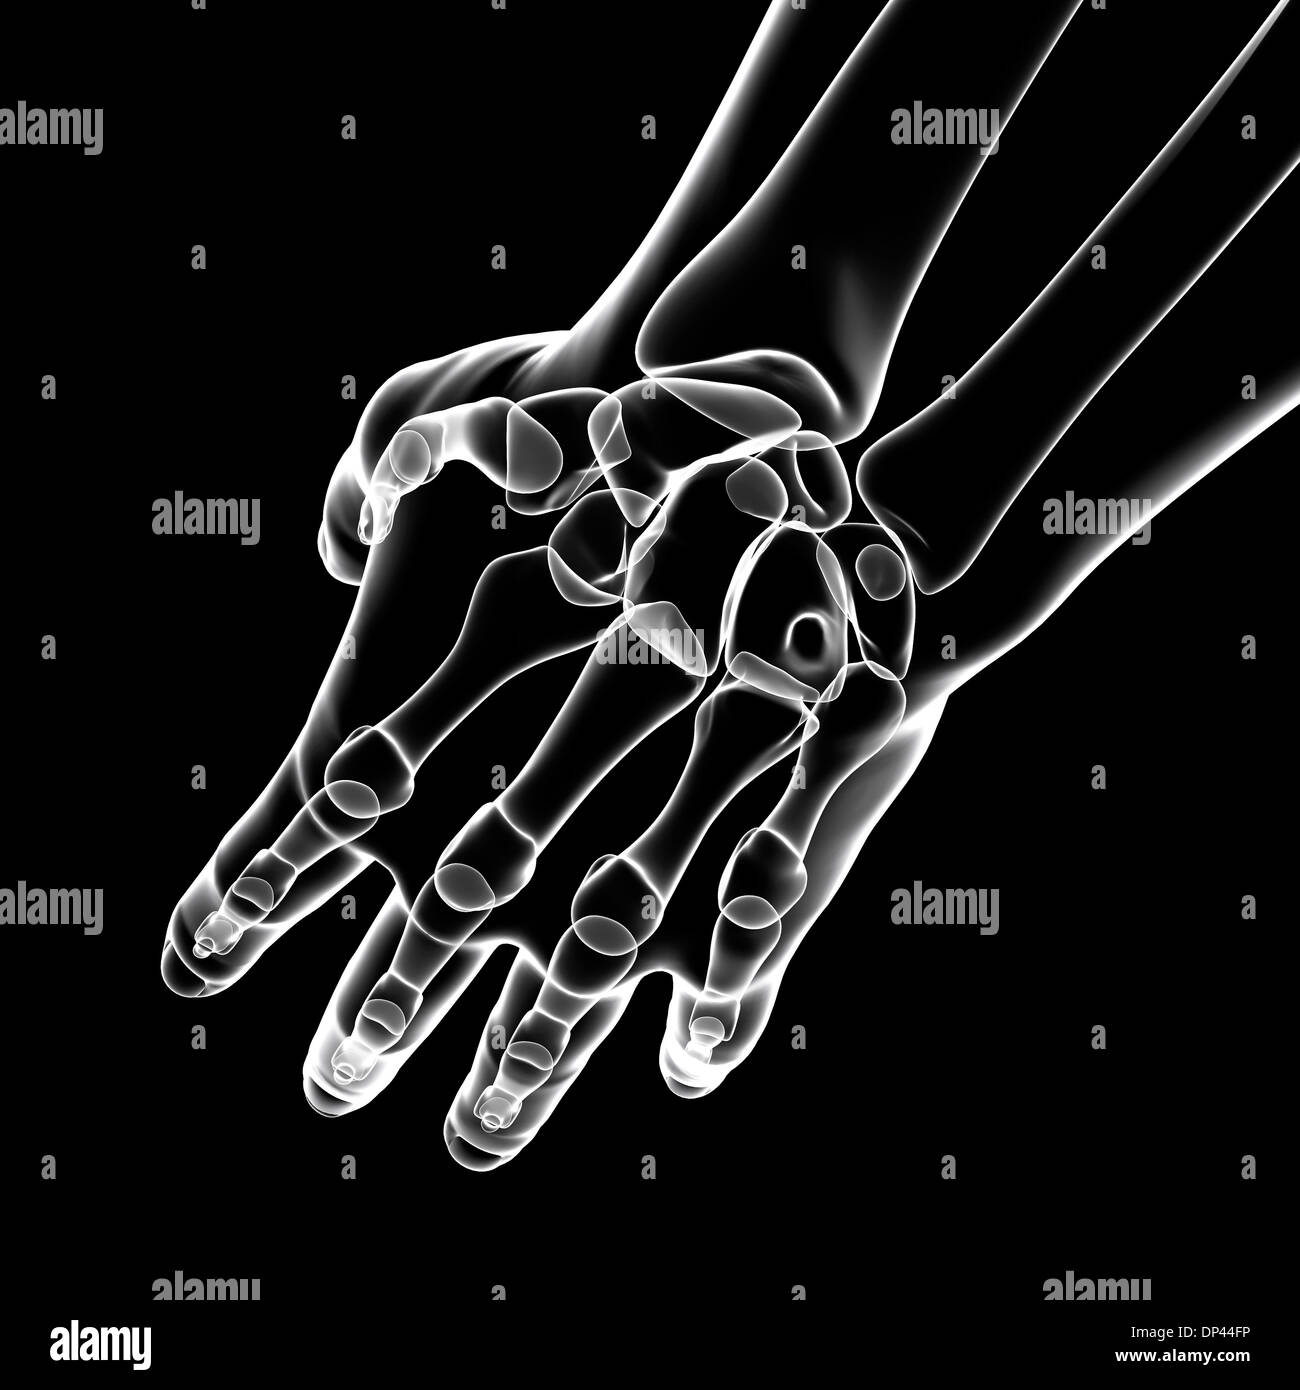 Human hand bones, artwork Stock Photo: 65244922 - Alamy